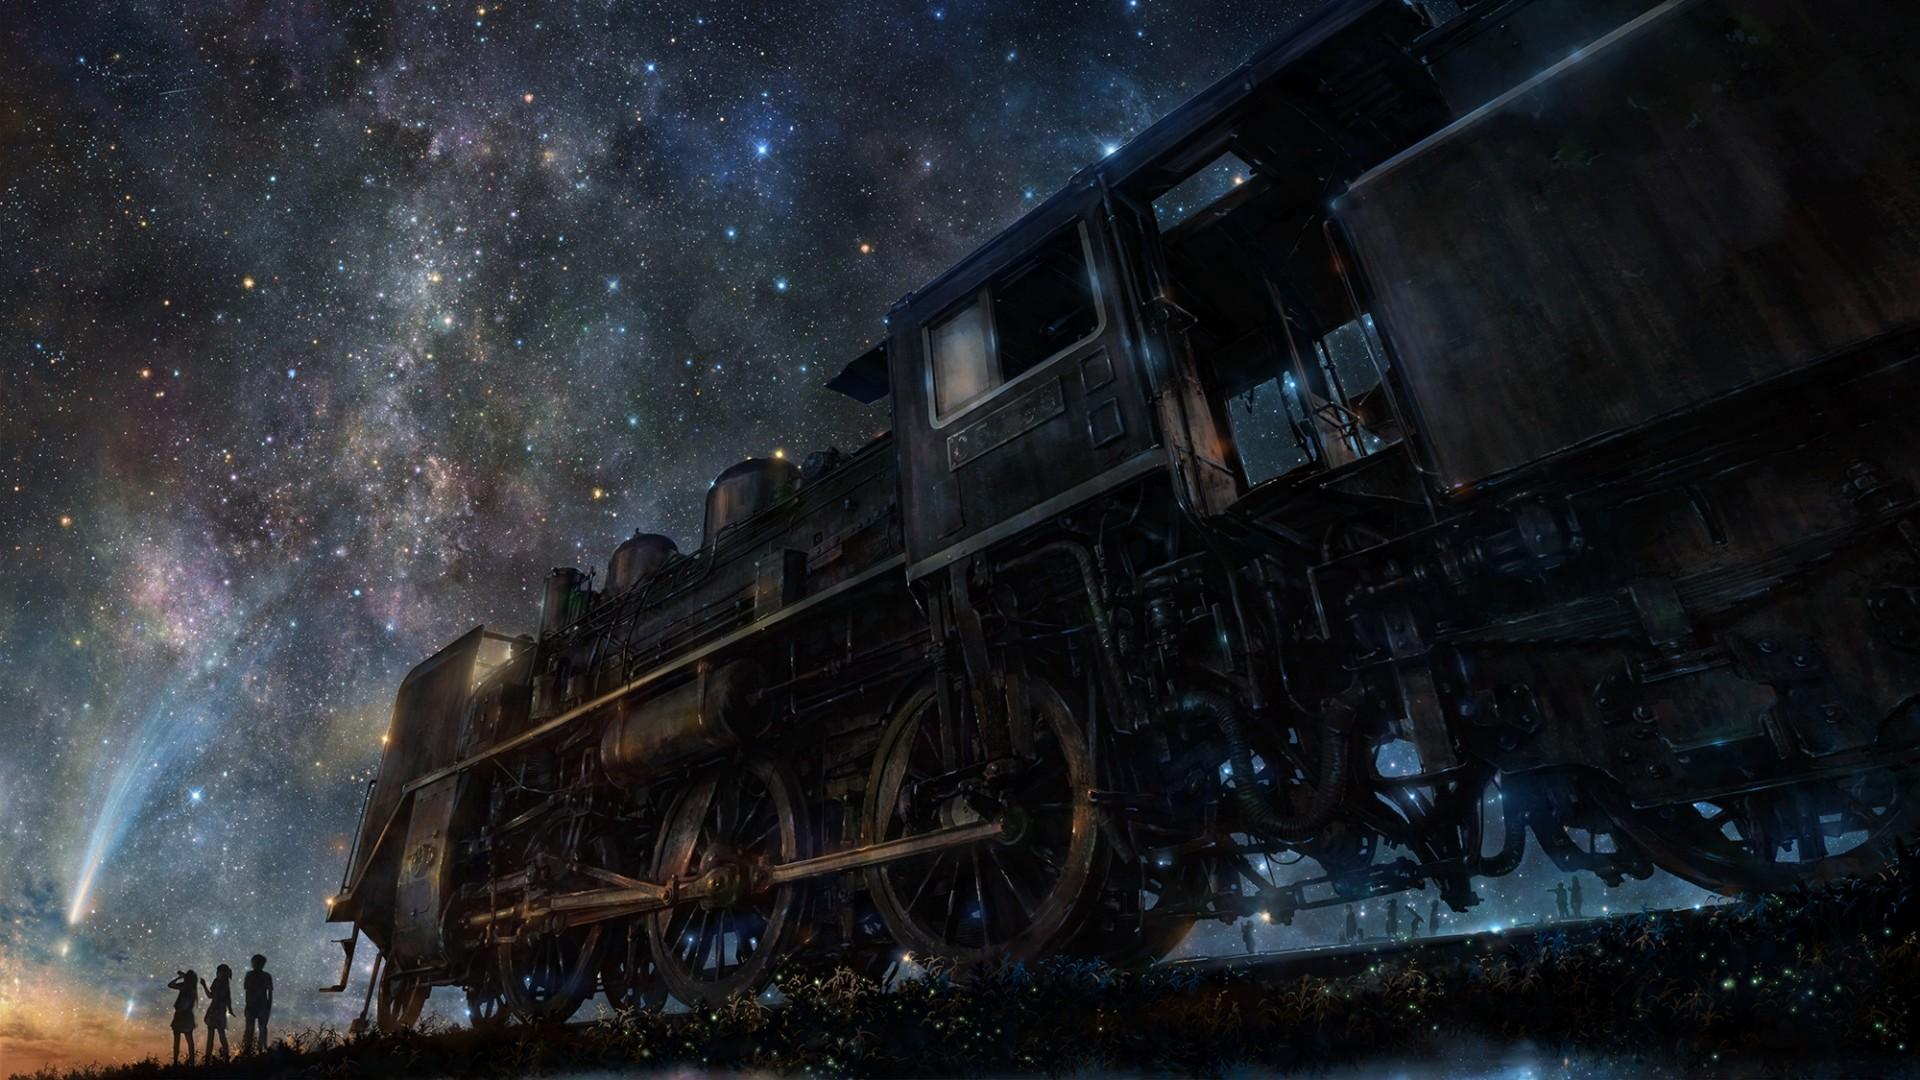 Preview wallpaper iy tujiki, art, night, train, anime, starry sky 1920×1080